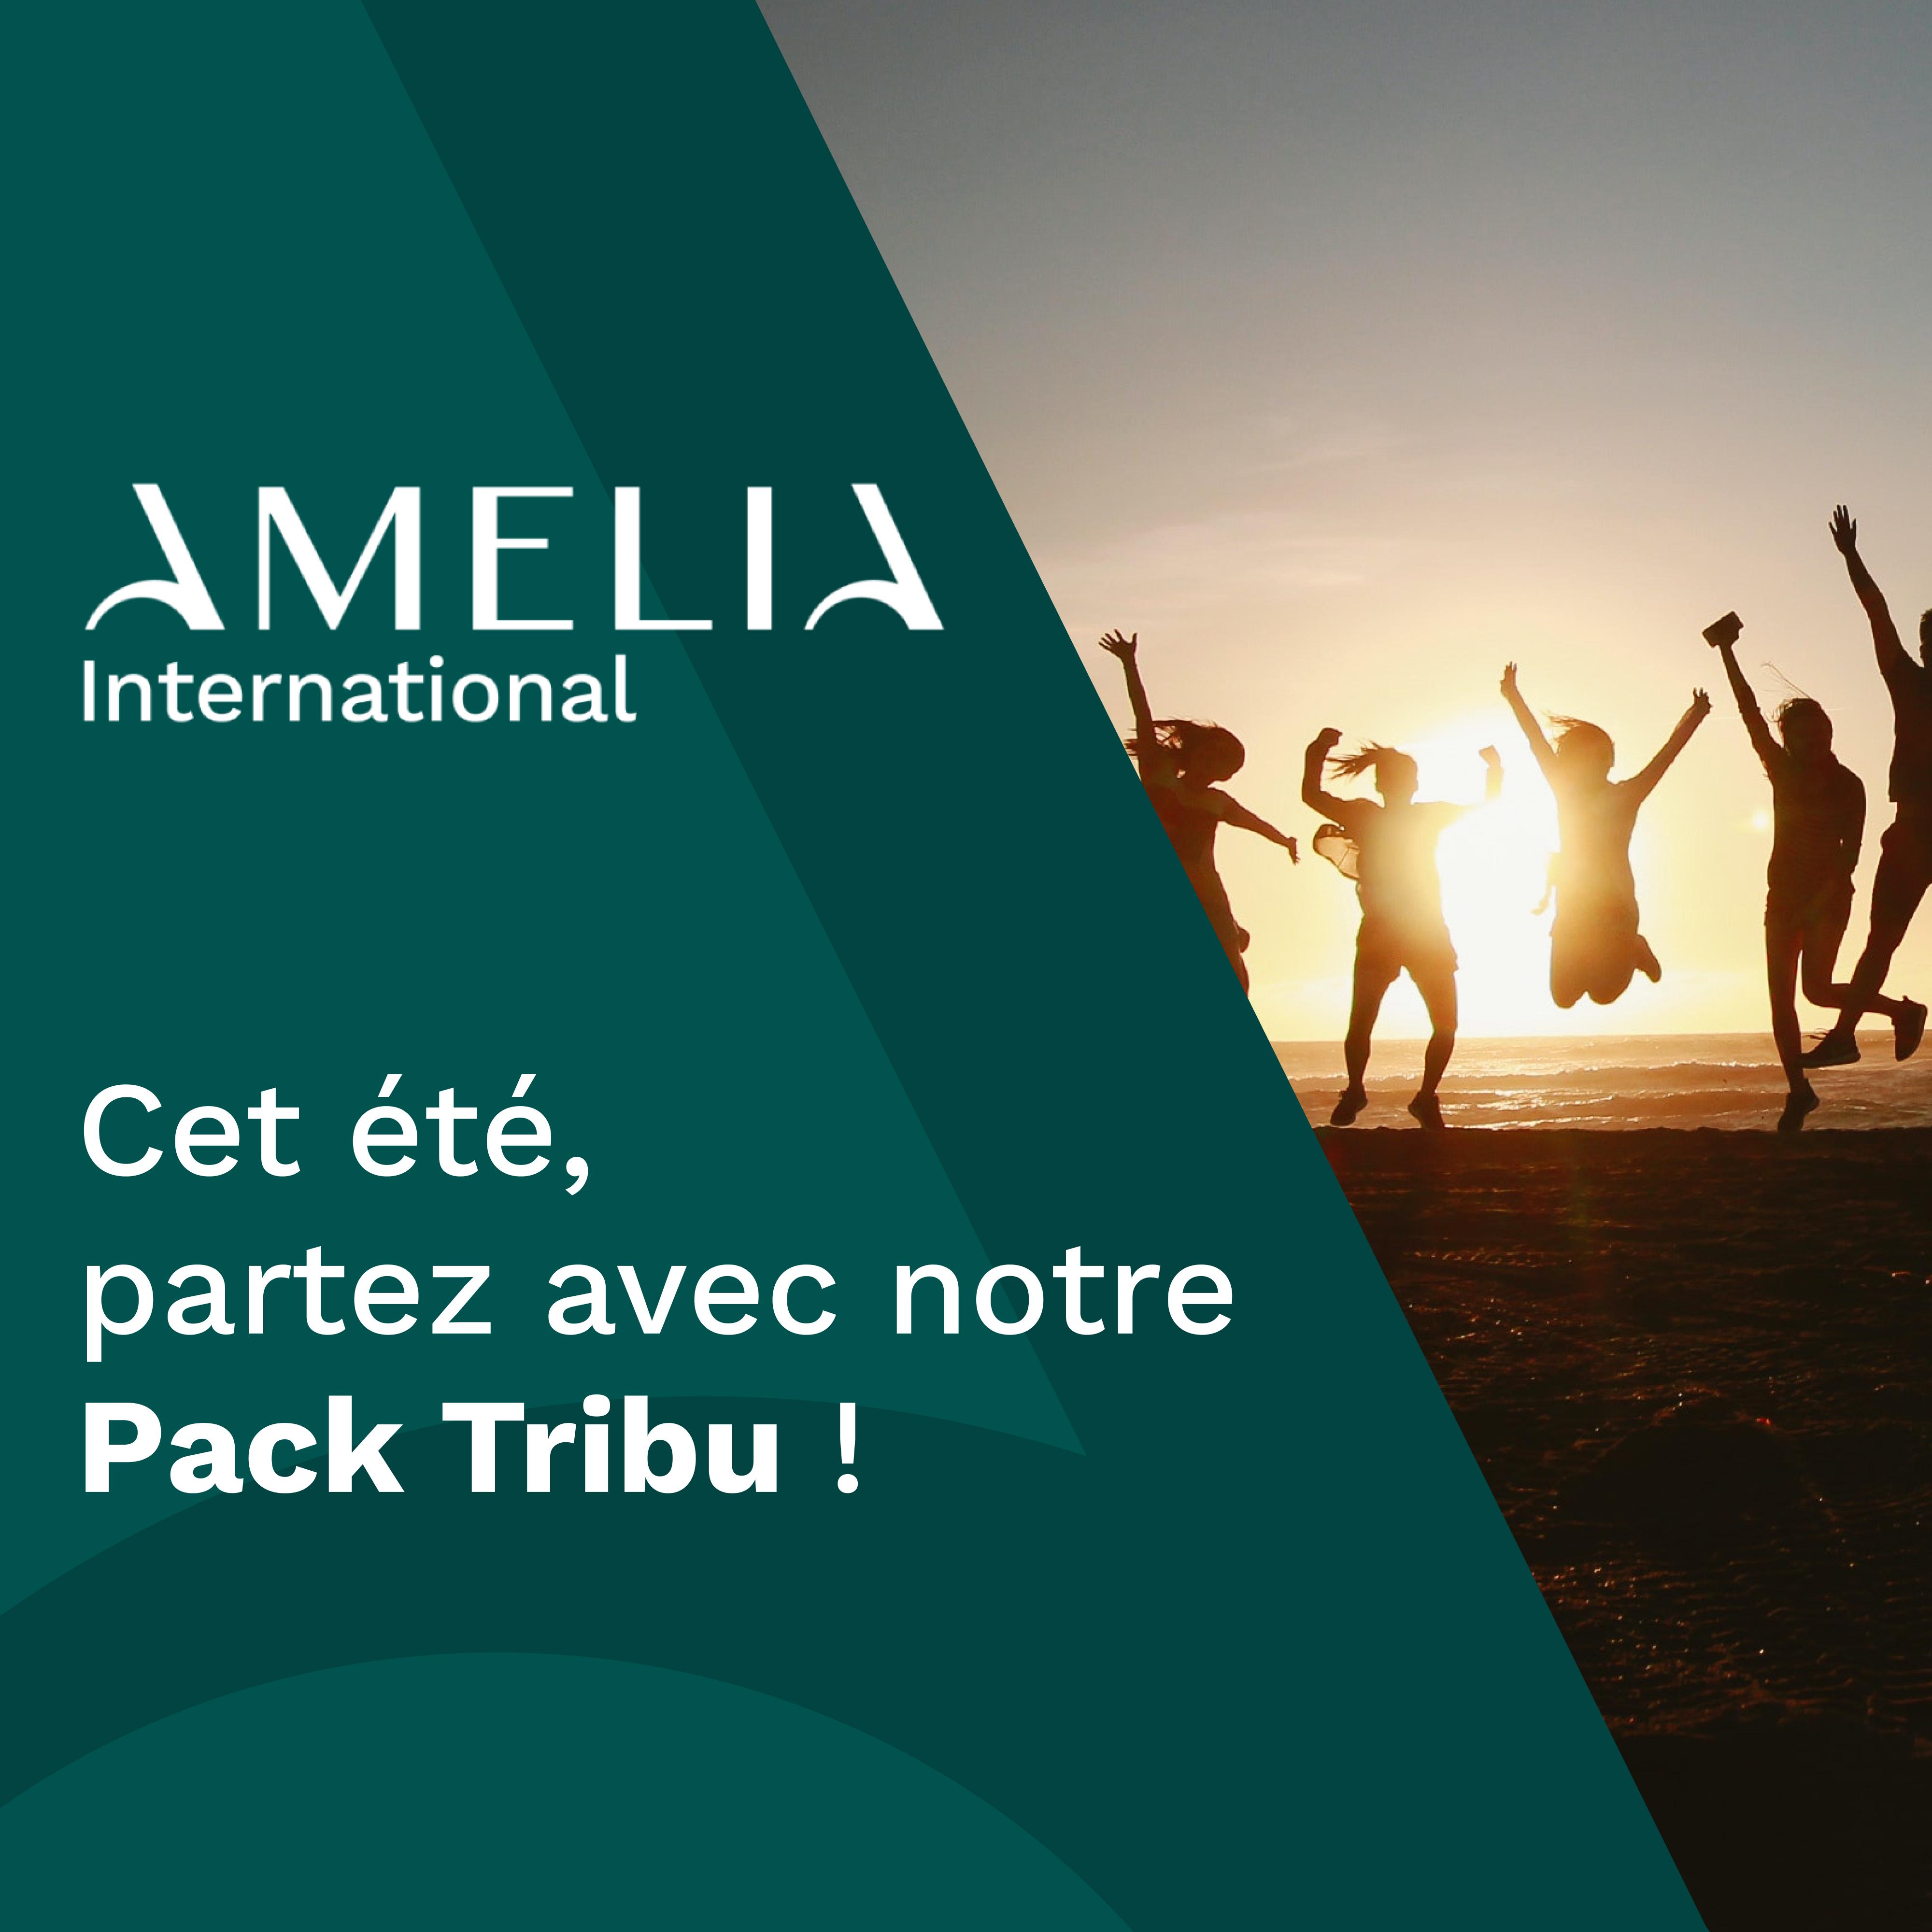 Pack tribu Amelia